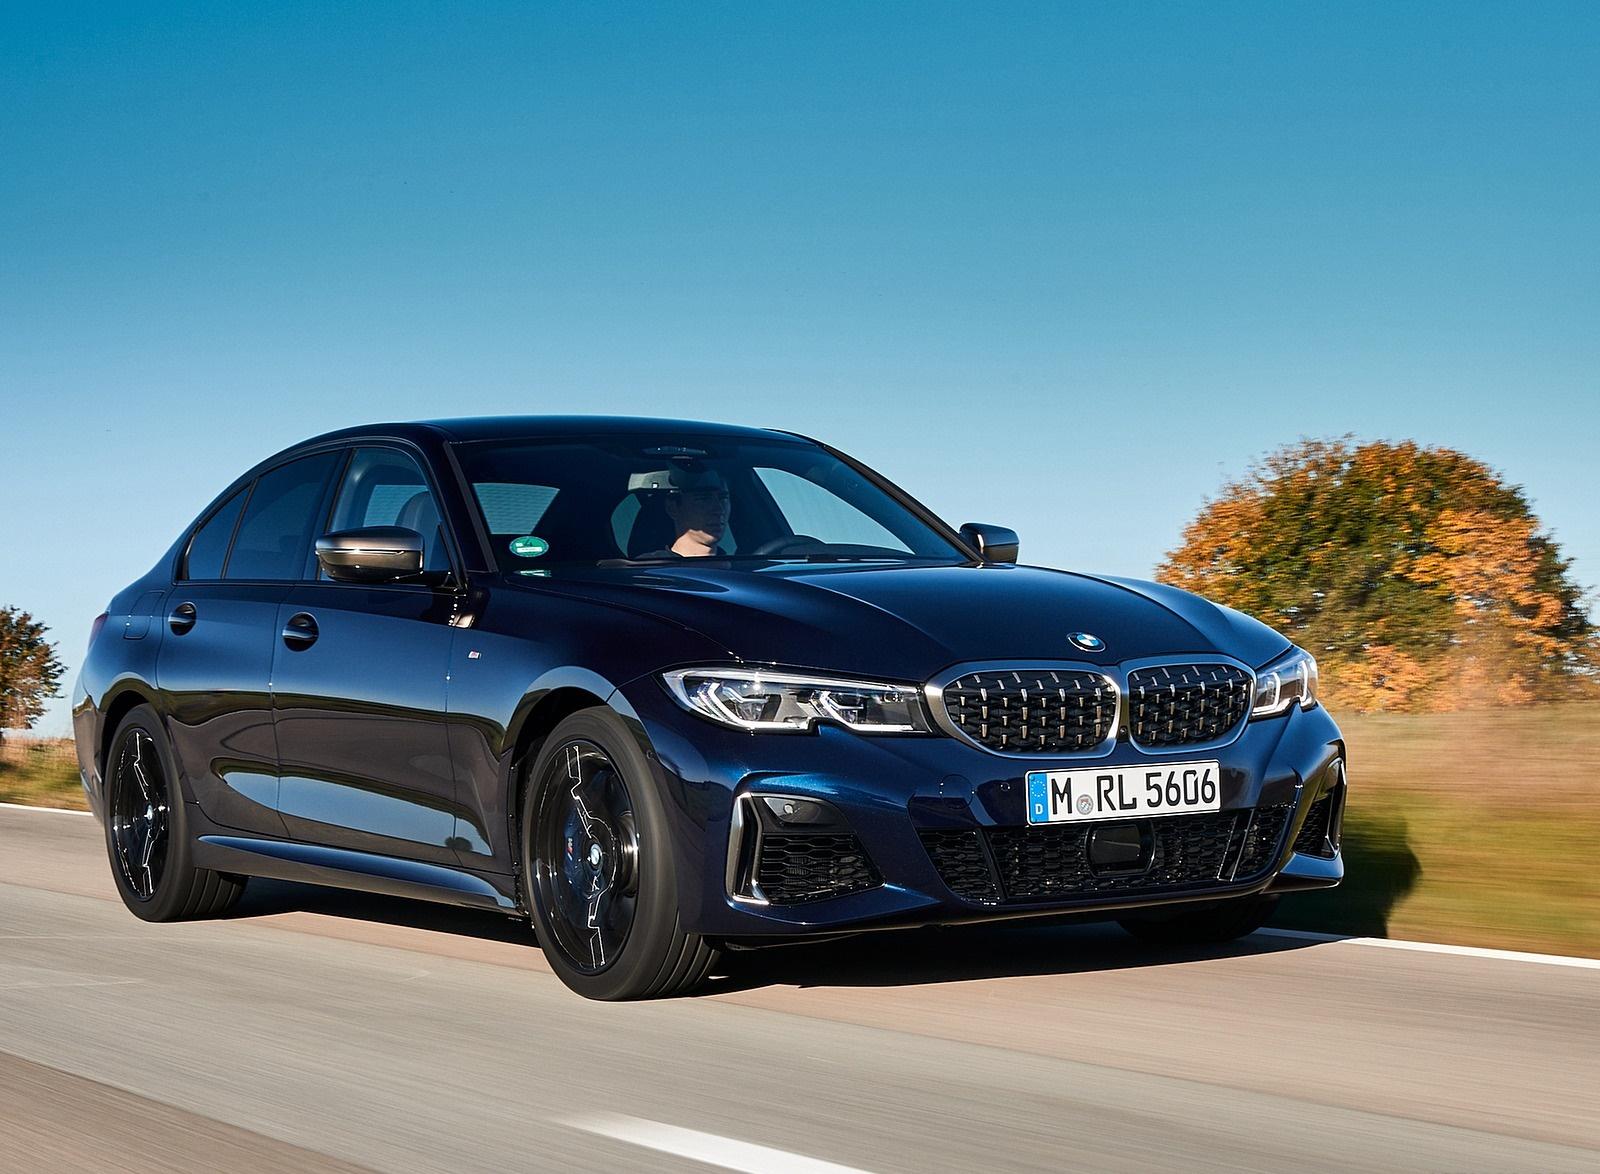 2020 BMW M340i Sedan (Color: Tanzanite Blue Metallic) Front Three-Quarter Wallpapers #6 of 74